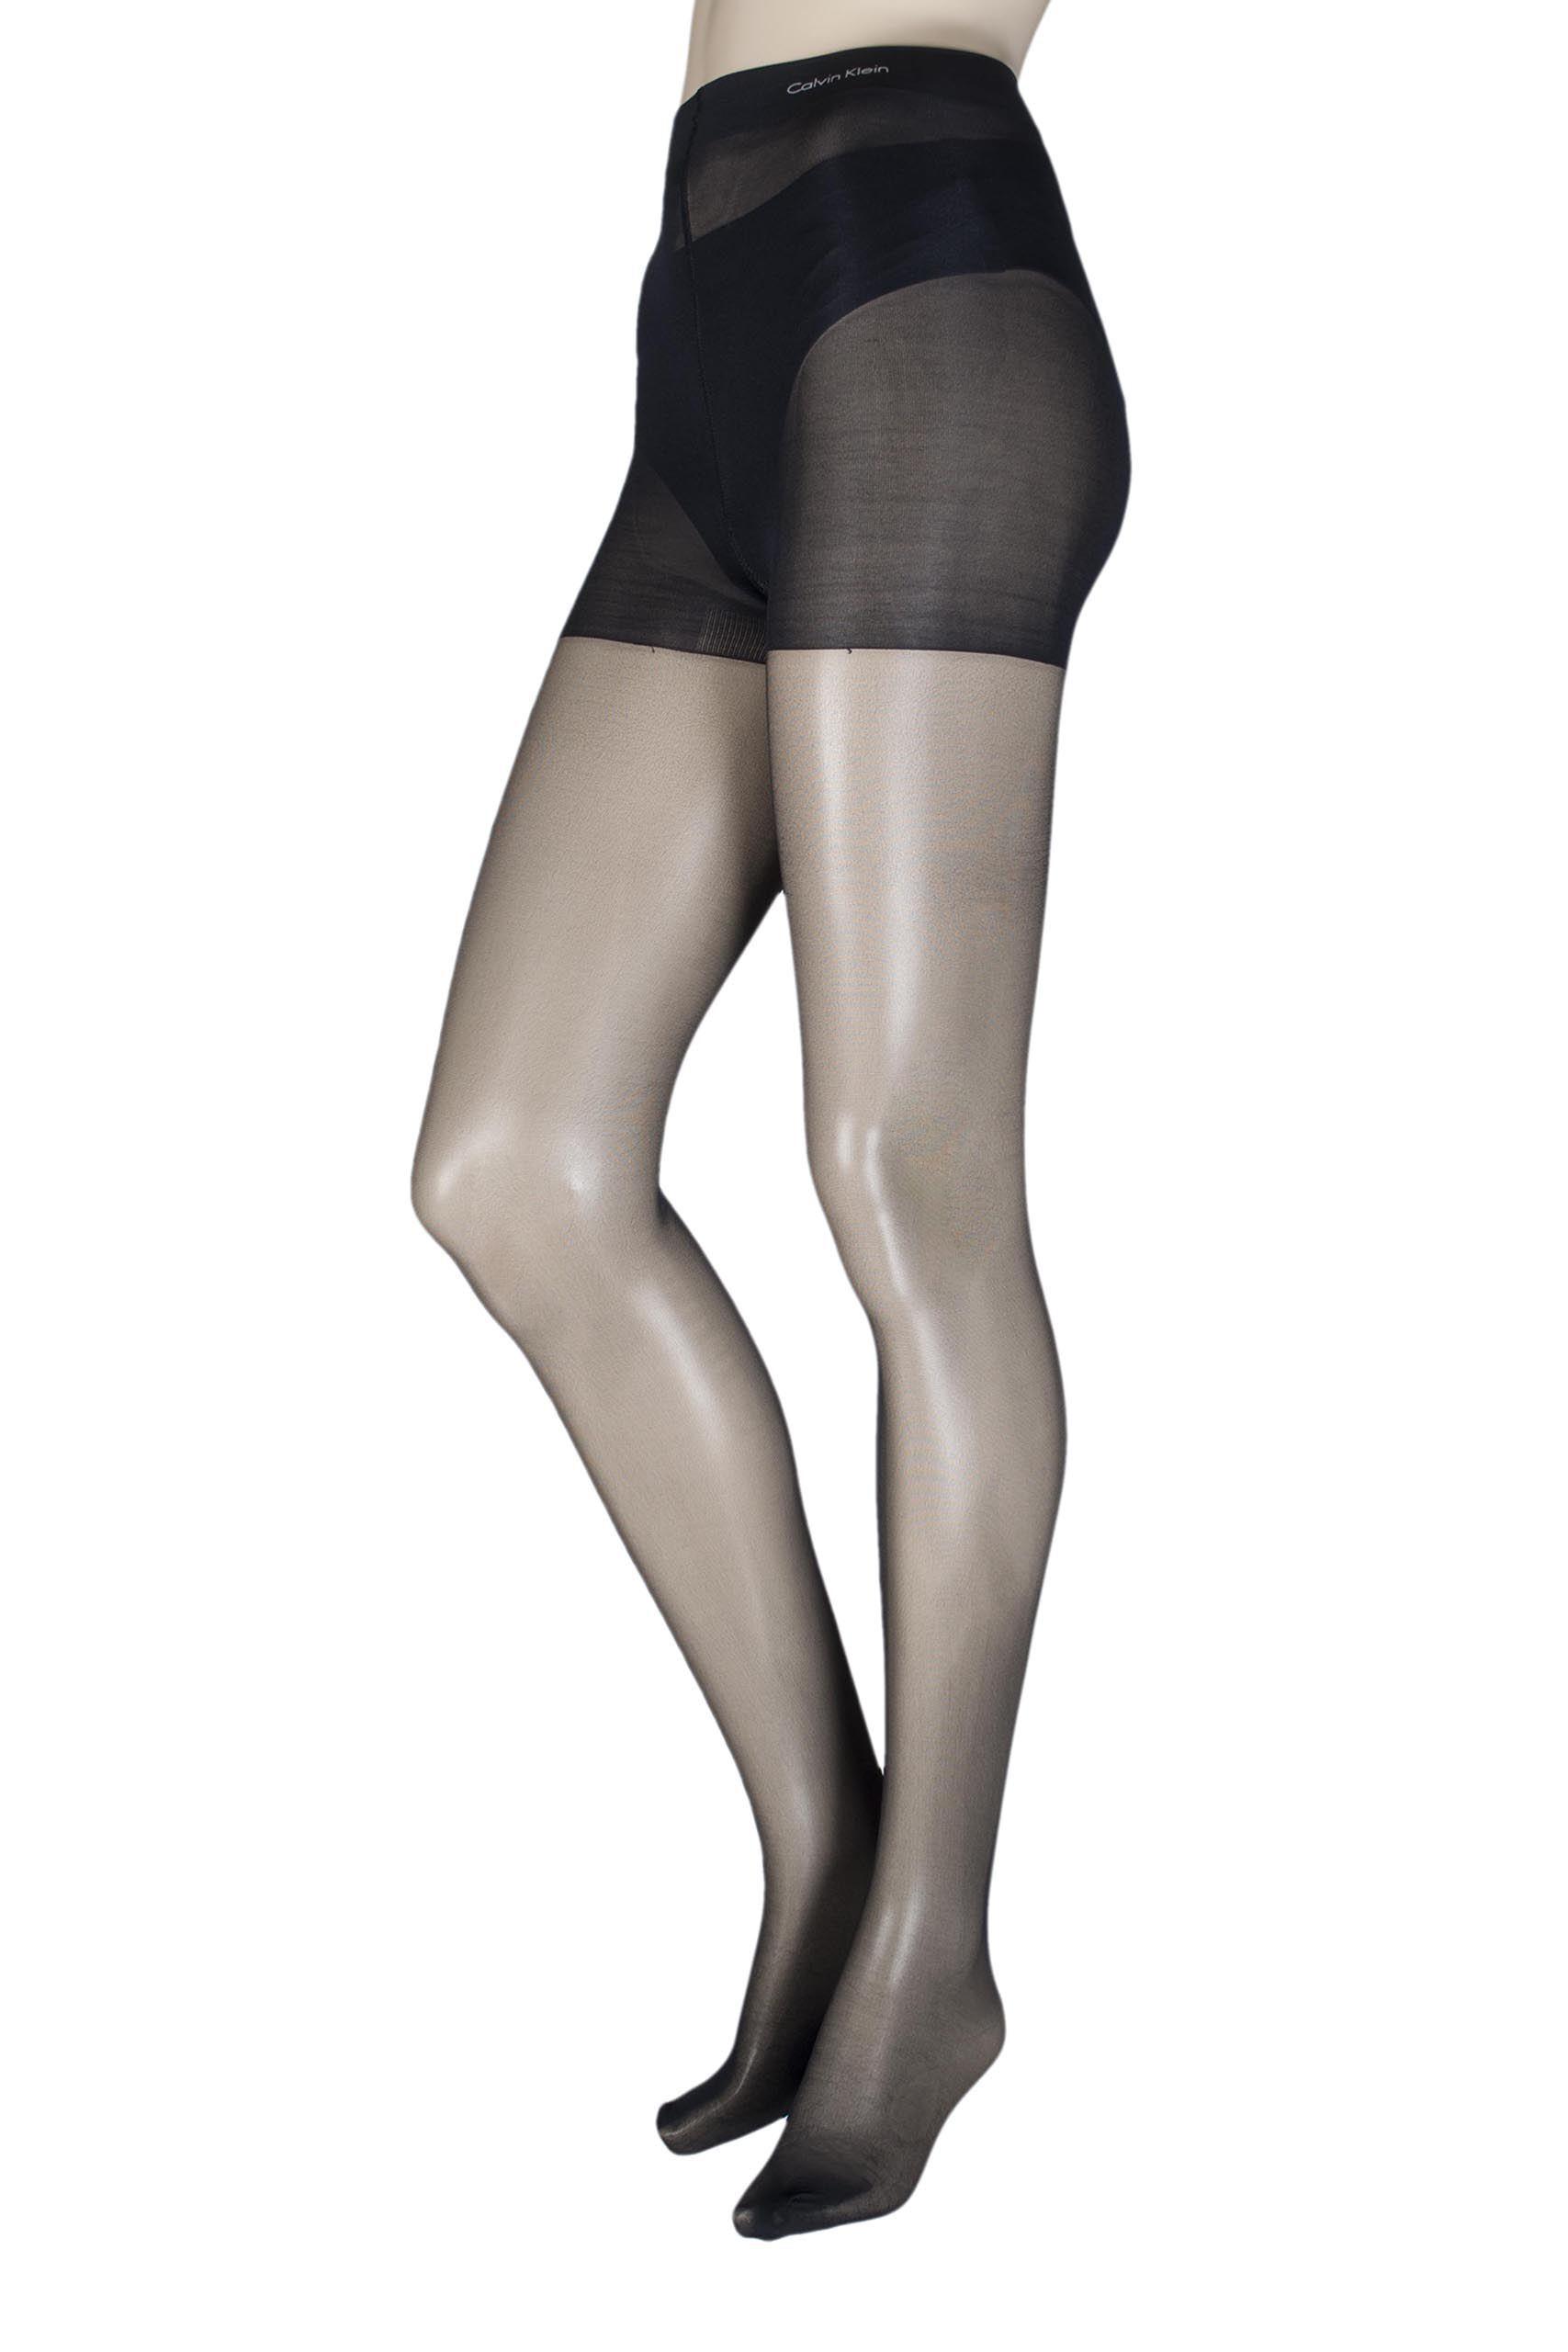 Image of 1 Pair Black Sheer Essentials 15 Denier Tights Ladies Extra Large - Calvin Klein